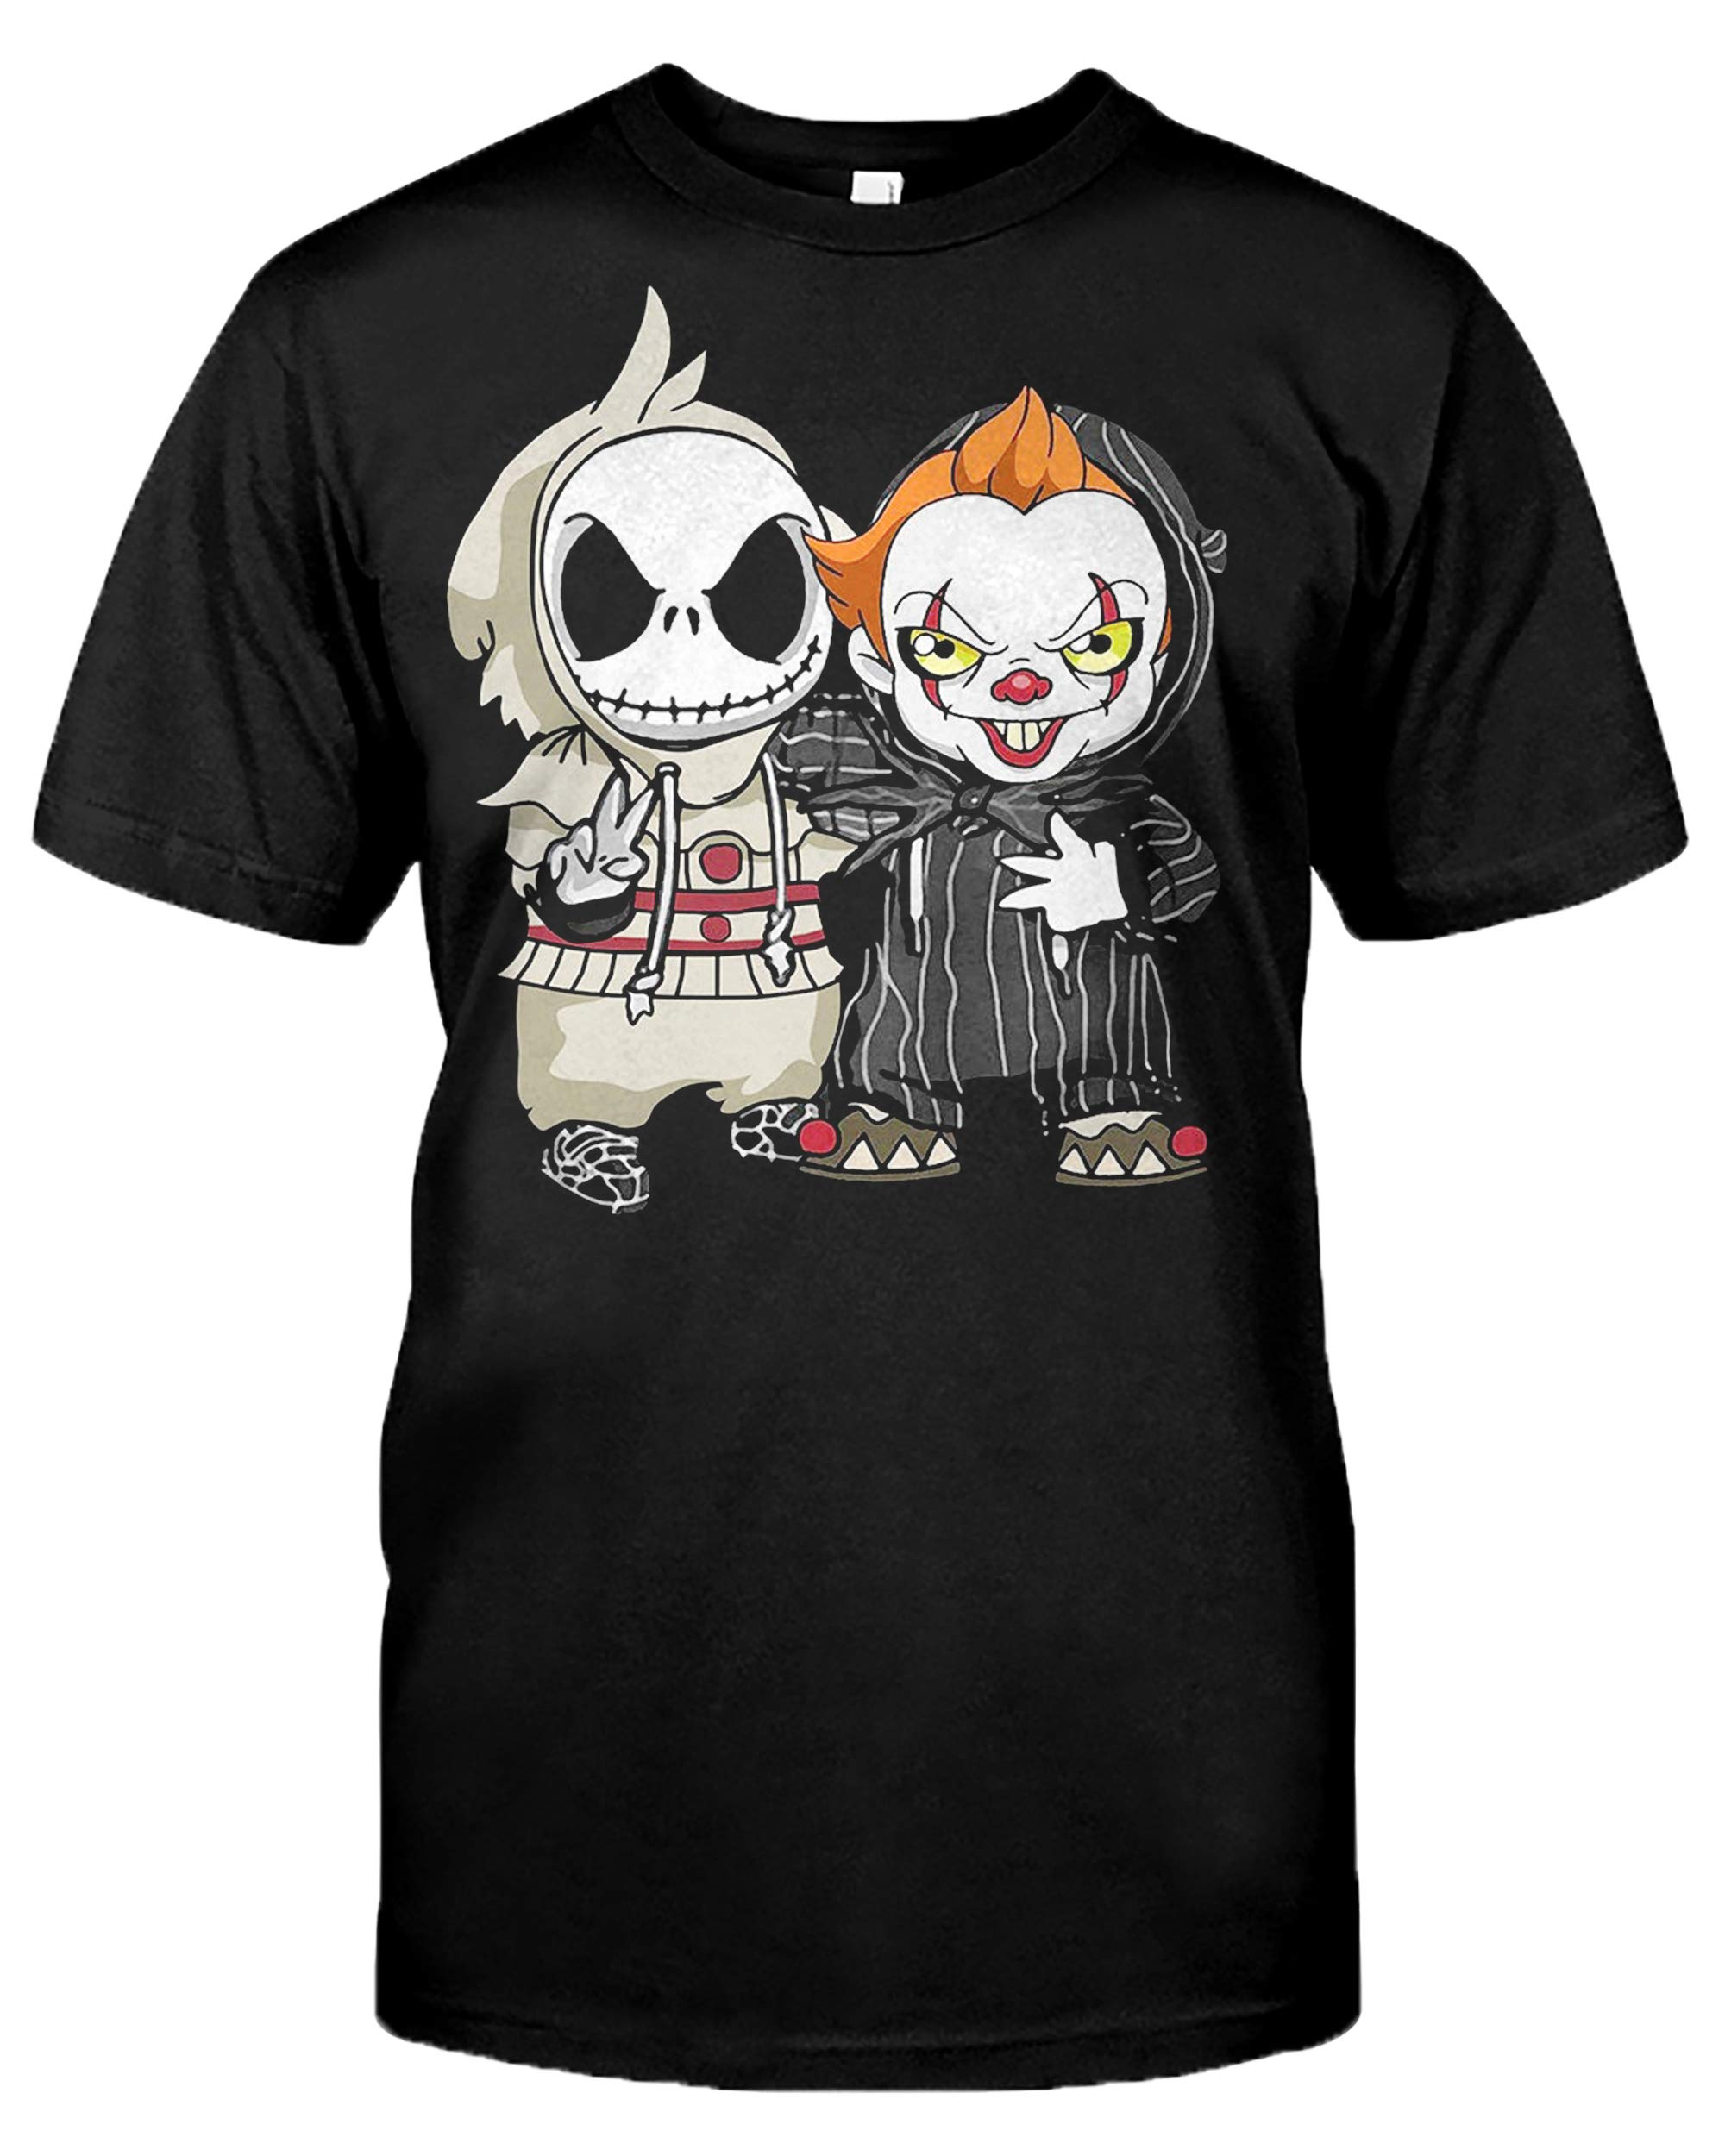 Clothing Change It Jack Pennywise Skellington Nightmare Funny Halloween T Shirt